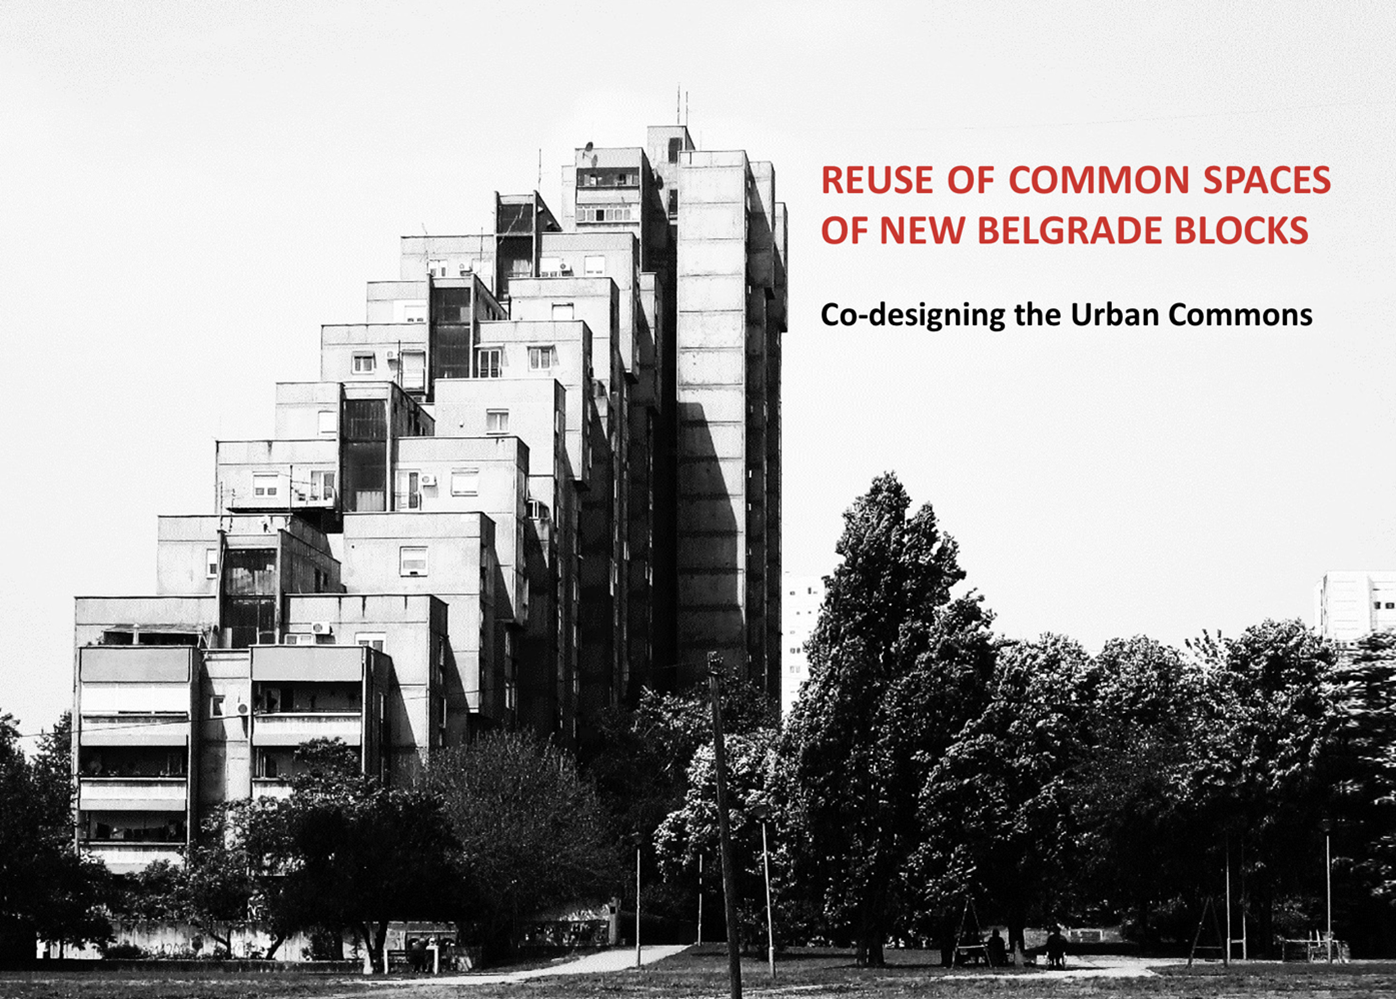 Održana radionica   Reuse of Common Spaces of New Belgrade Blocks: Co-designing the Urban Commons